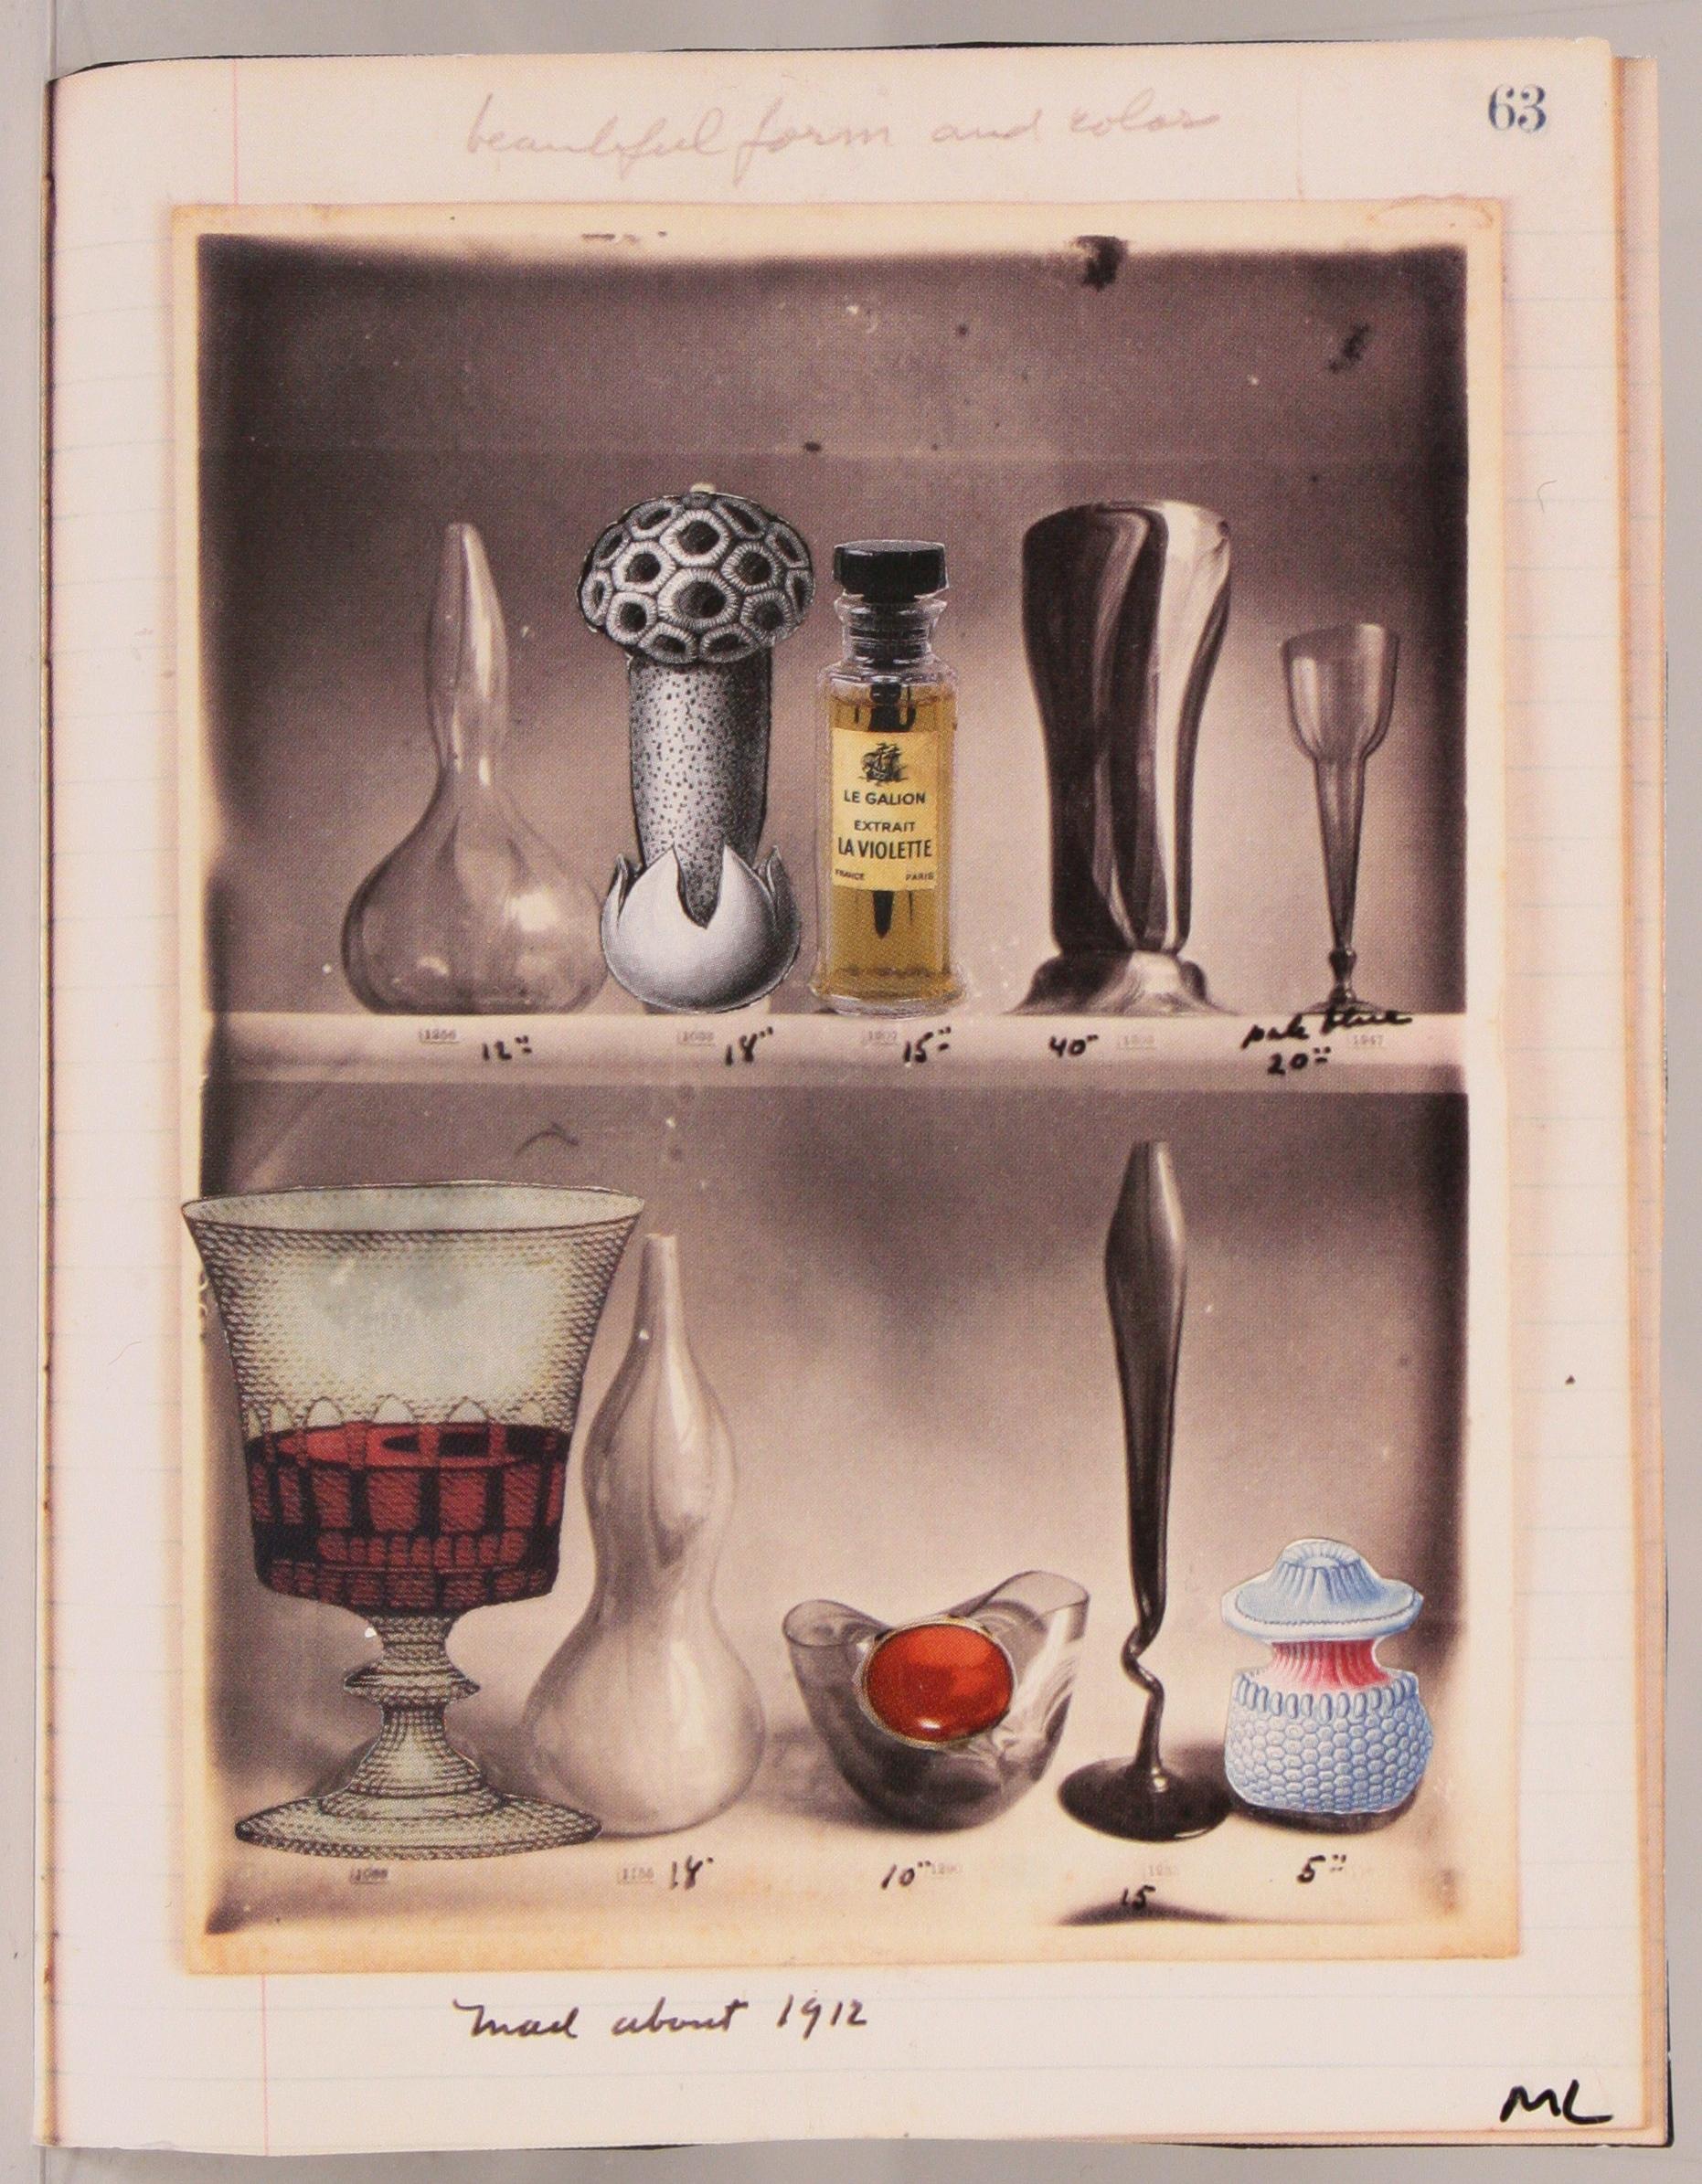 Medicine Cabinet #4 by Mara Lefebvre